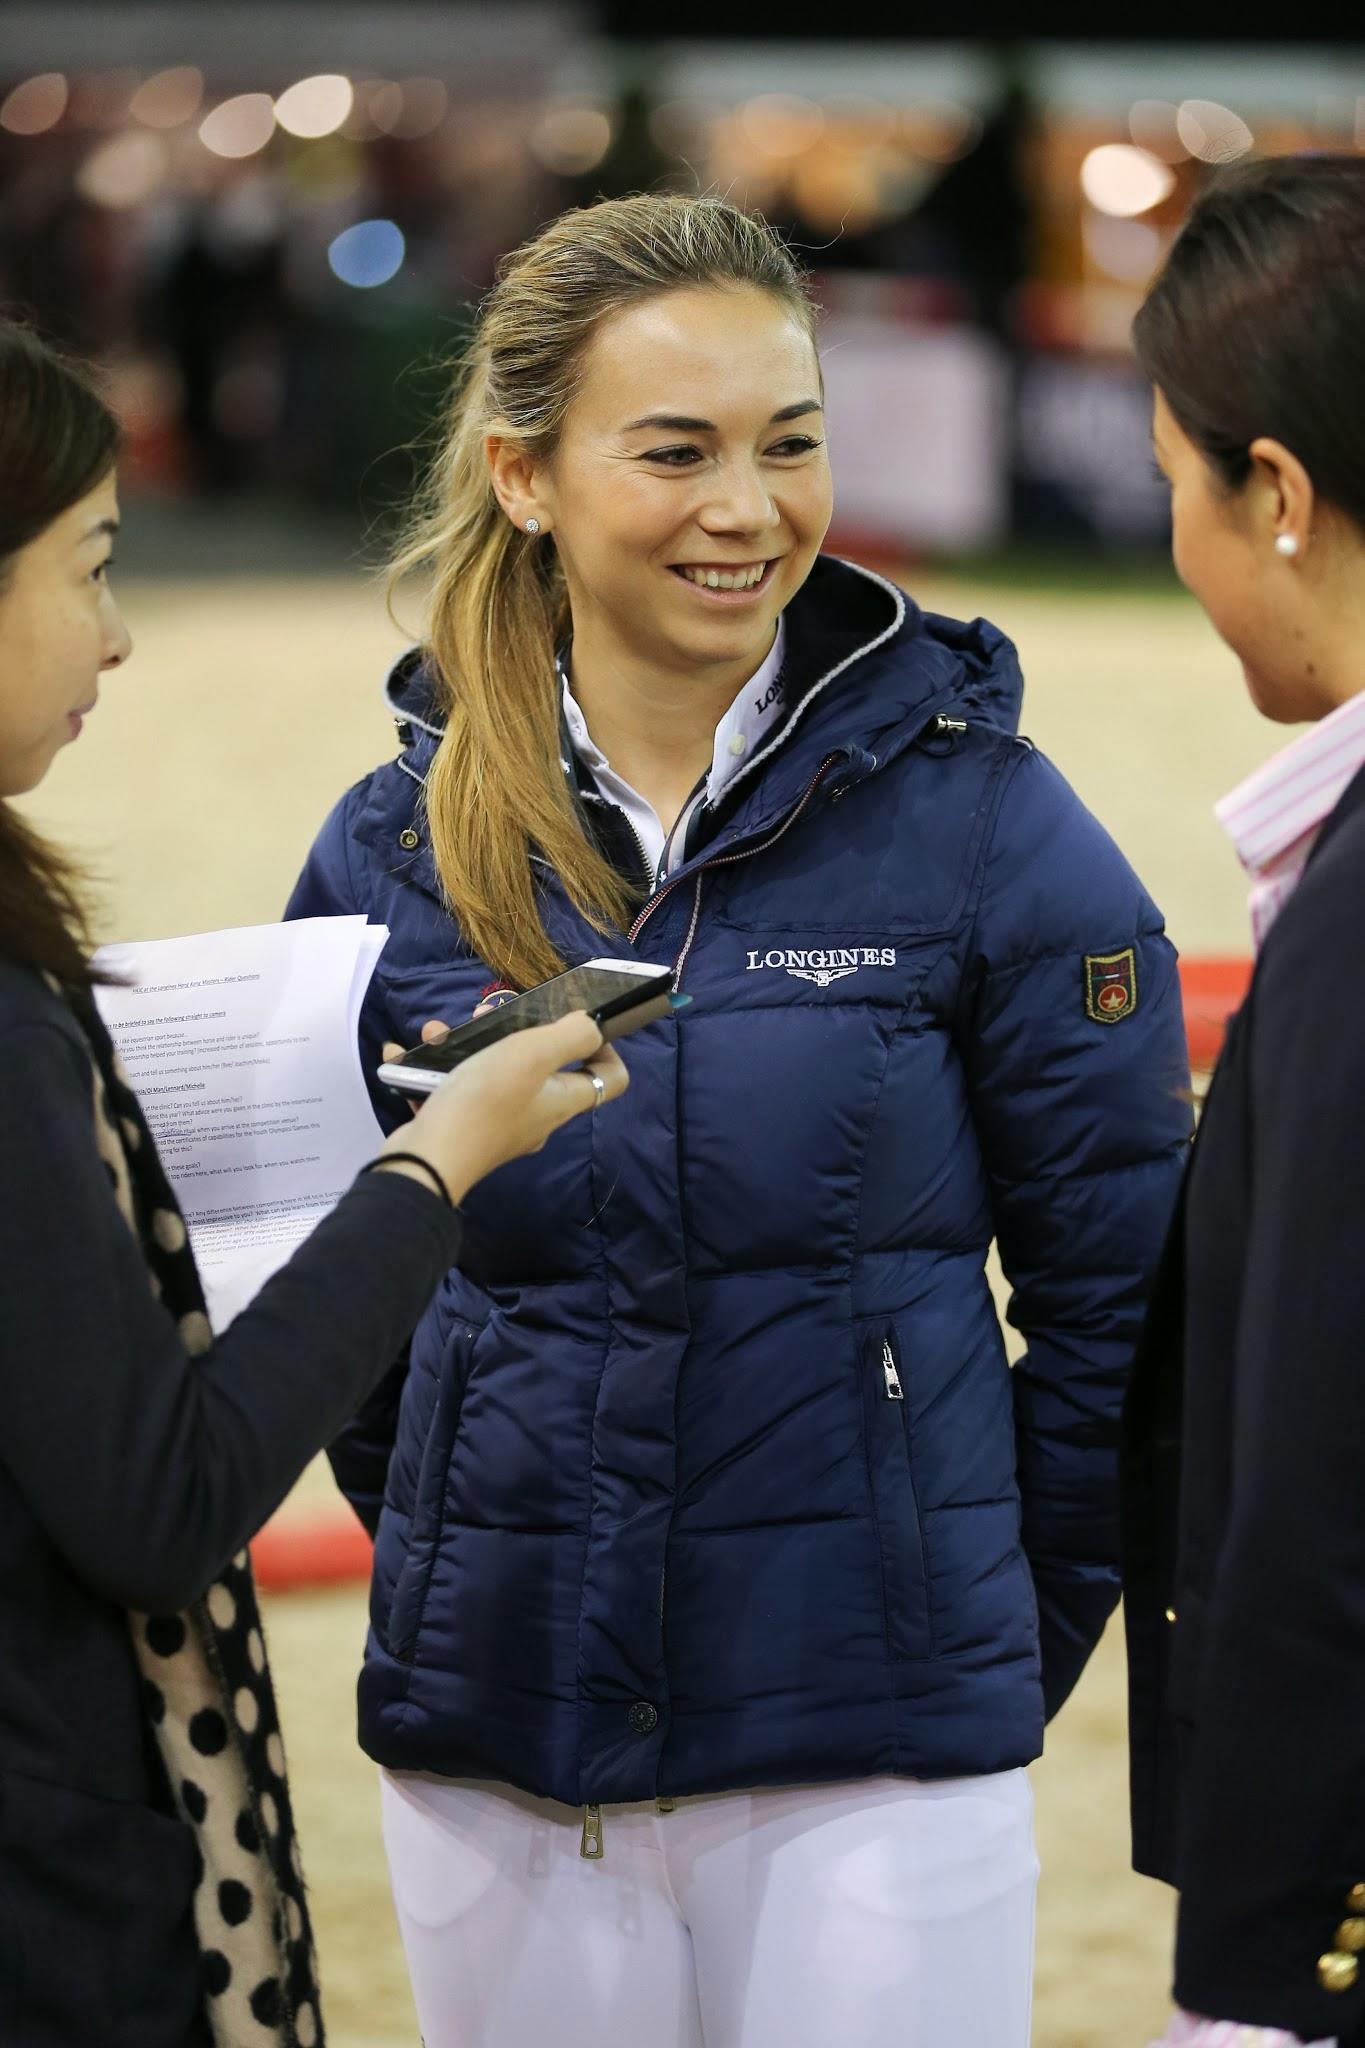 Longines HKG Masters 2014